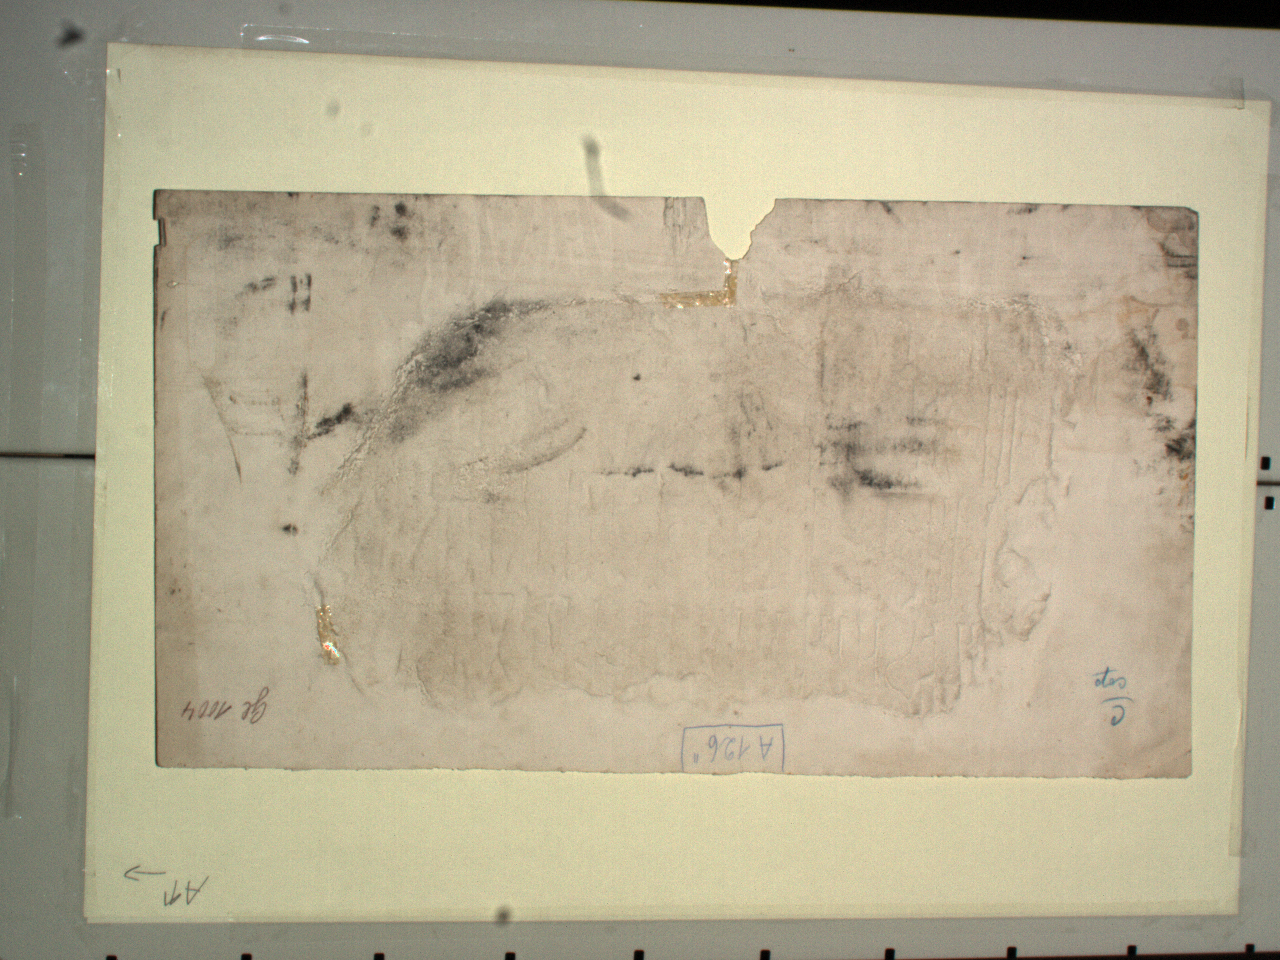 Construction inscription (GL1004 = CIH 329)